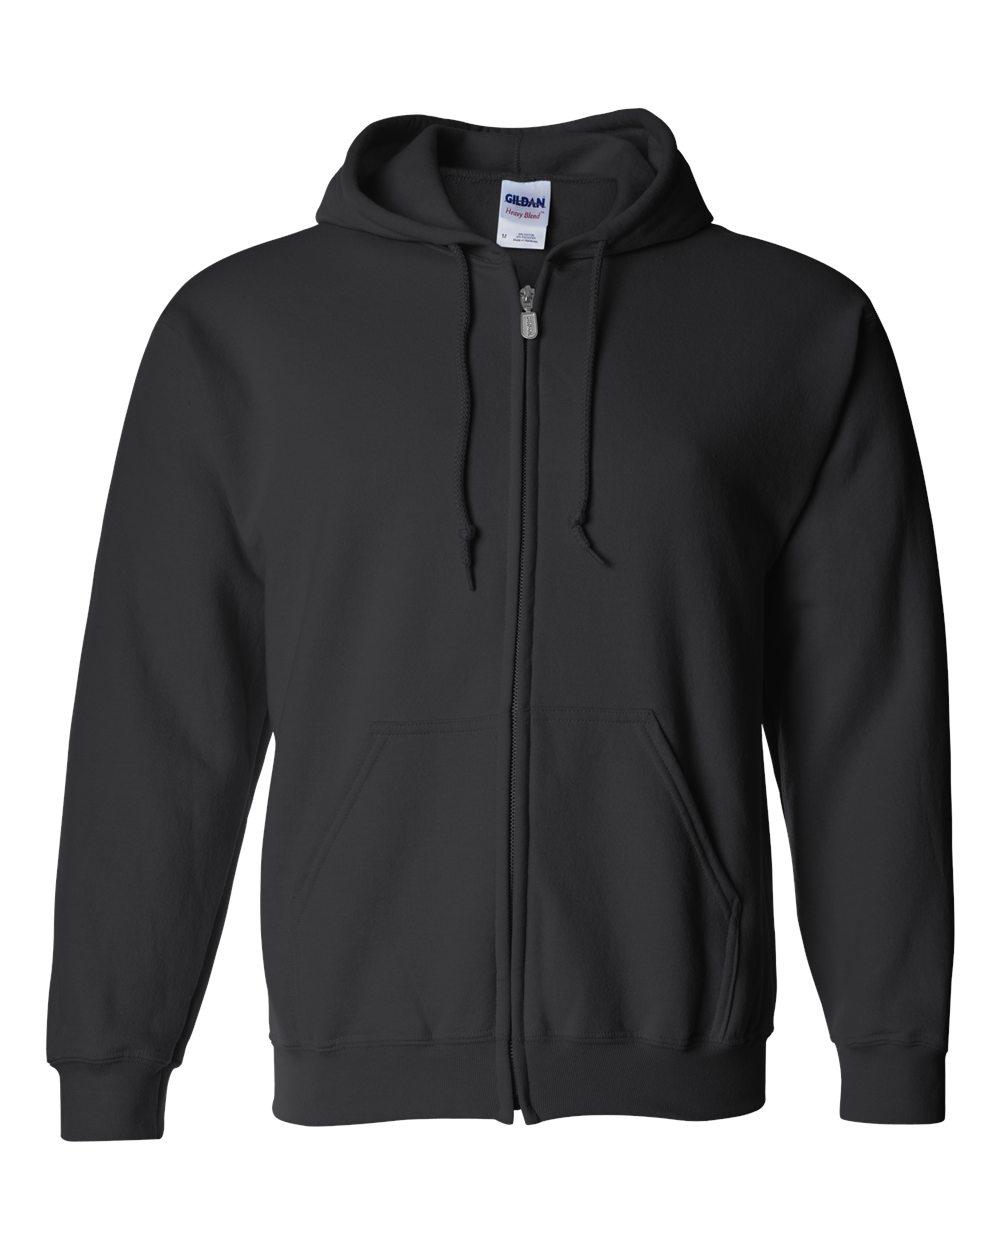 Picture of Gildan Heavyweight Blend Adult Full Zip Hooded Sweatshirt